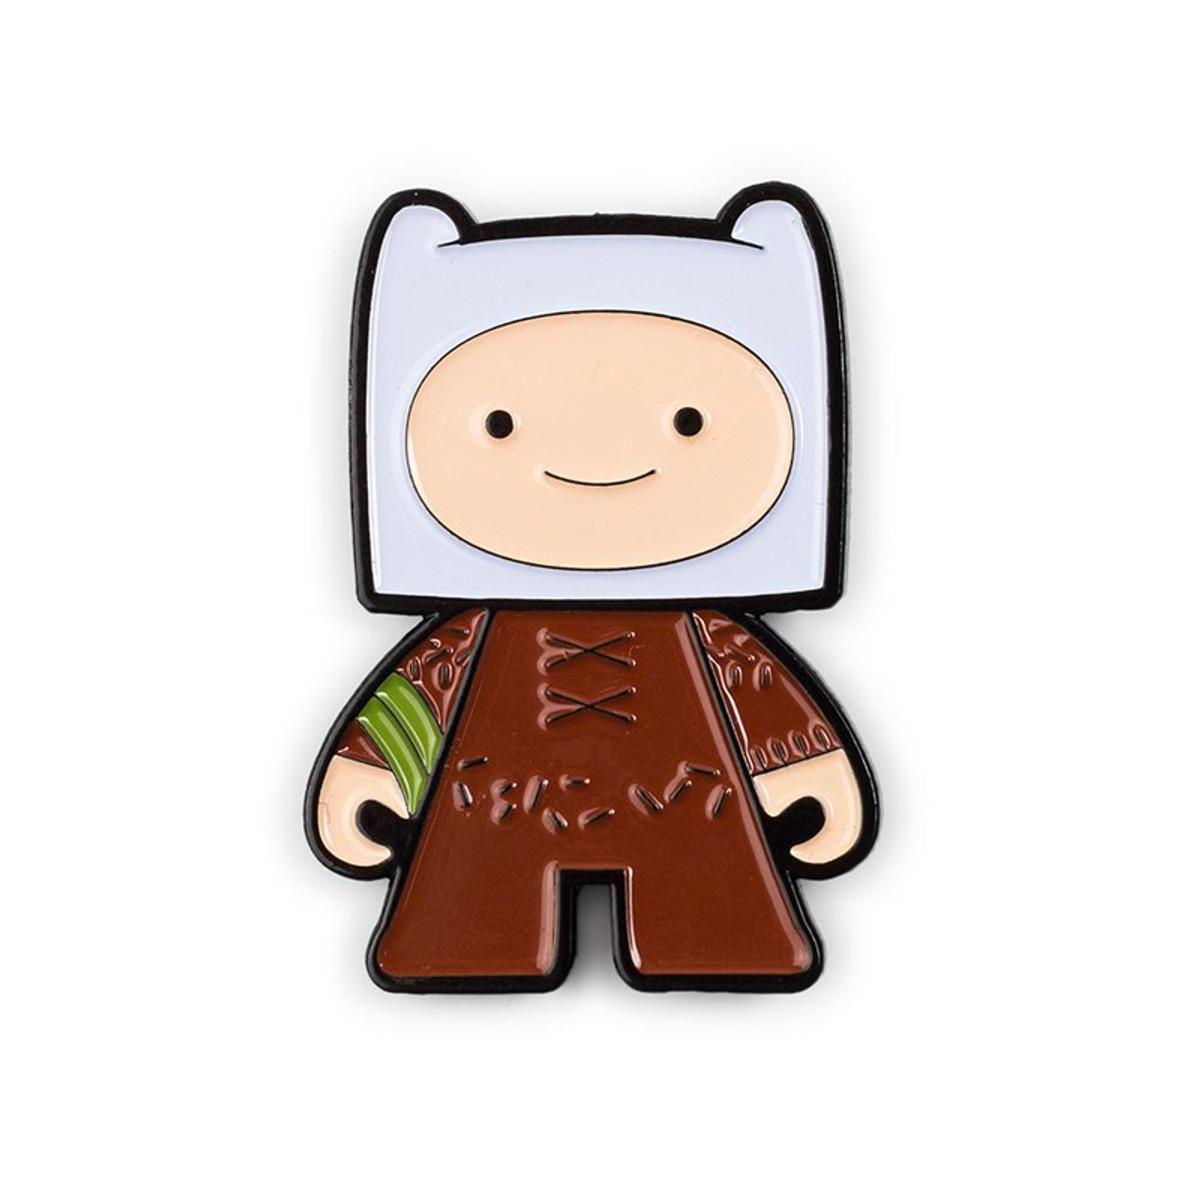 Adventure Time Enamel Pin Series Blind Box Myplasticheart